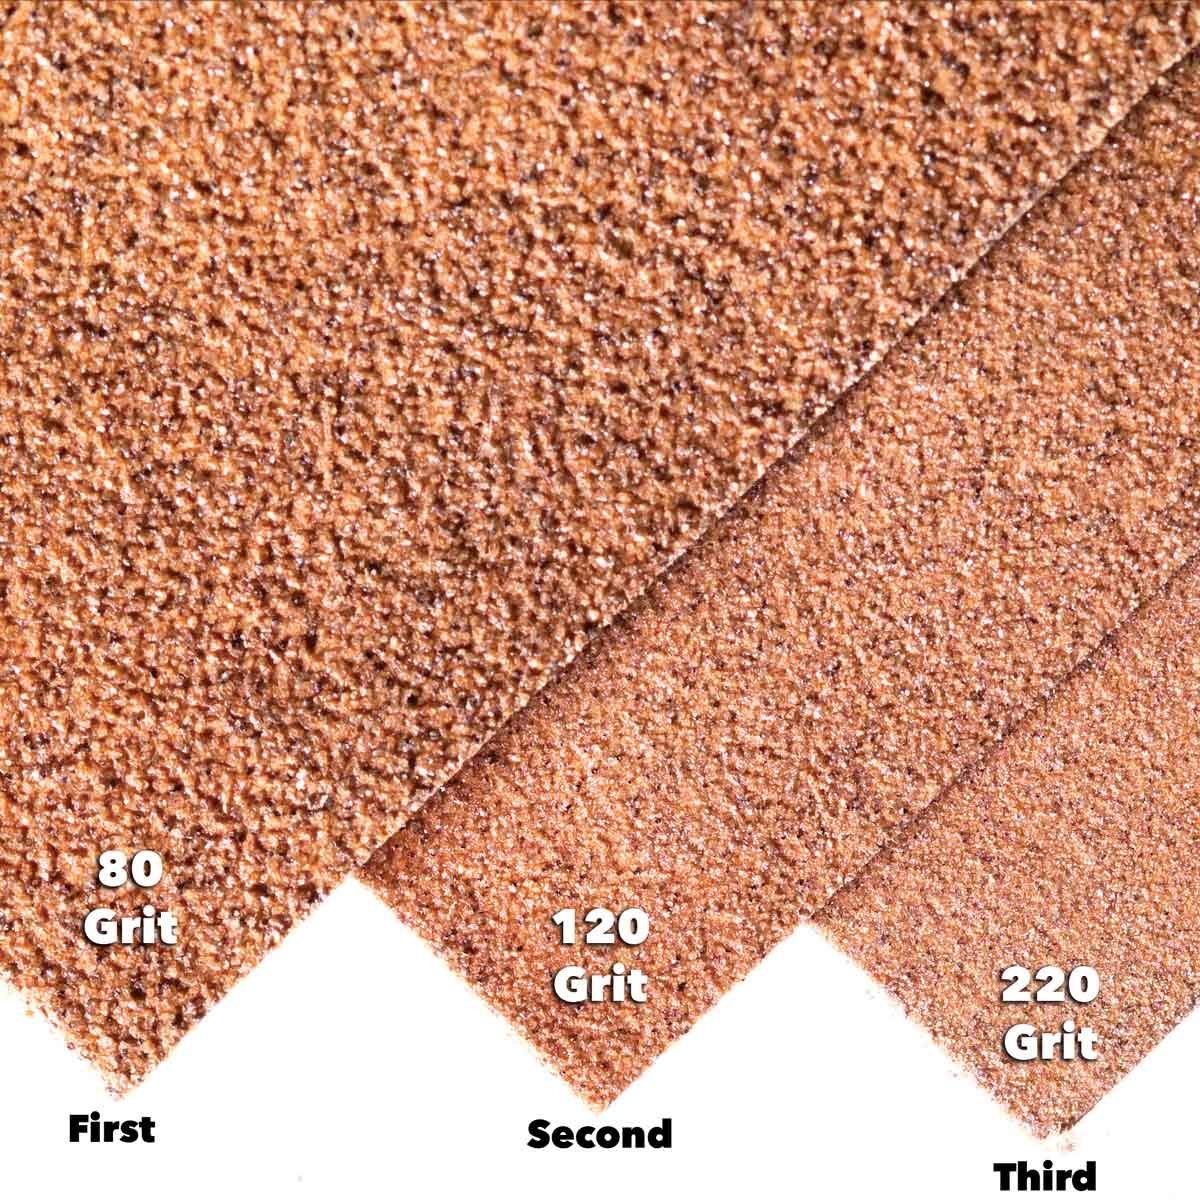 3 grits of sandpaper